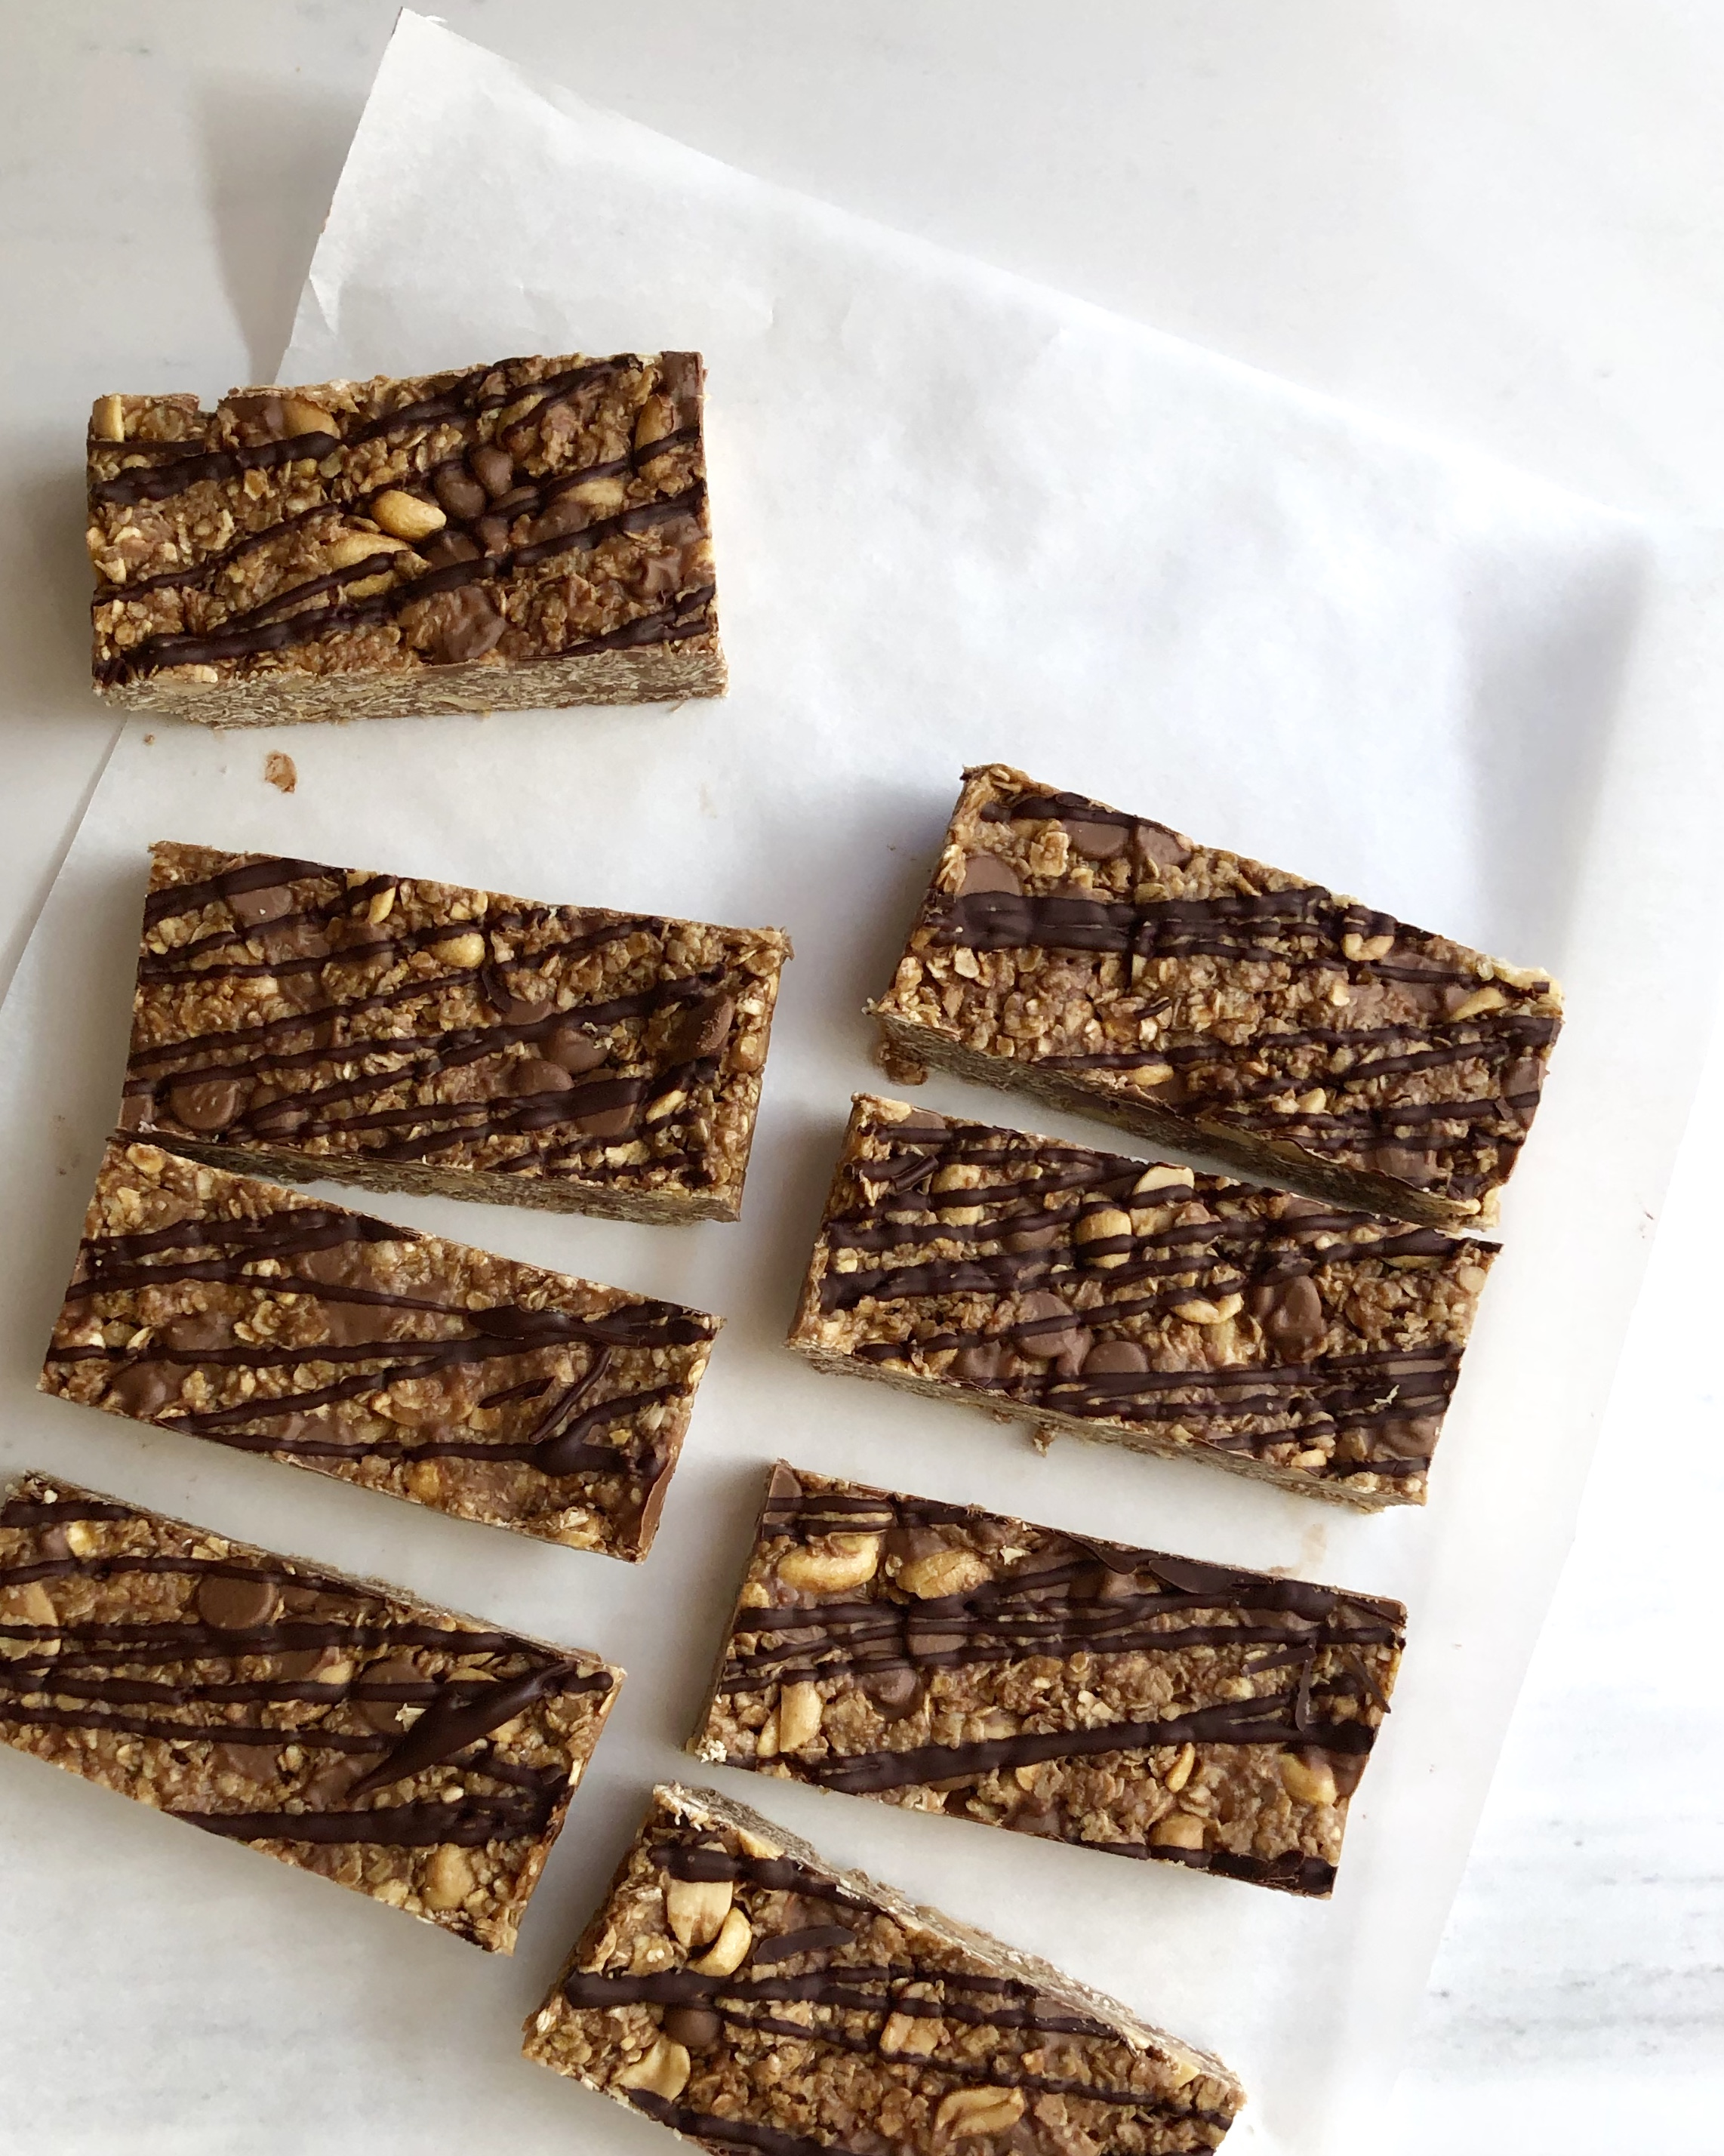 Peanut and Chocolate Granola Bars